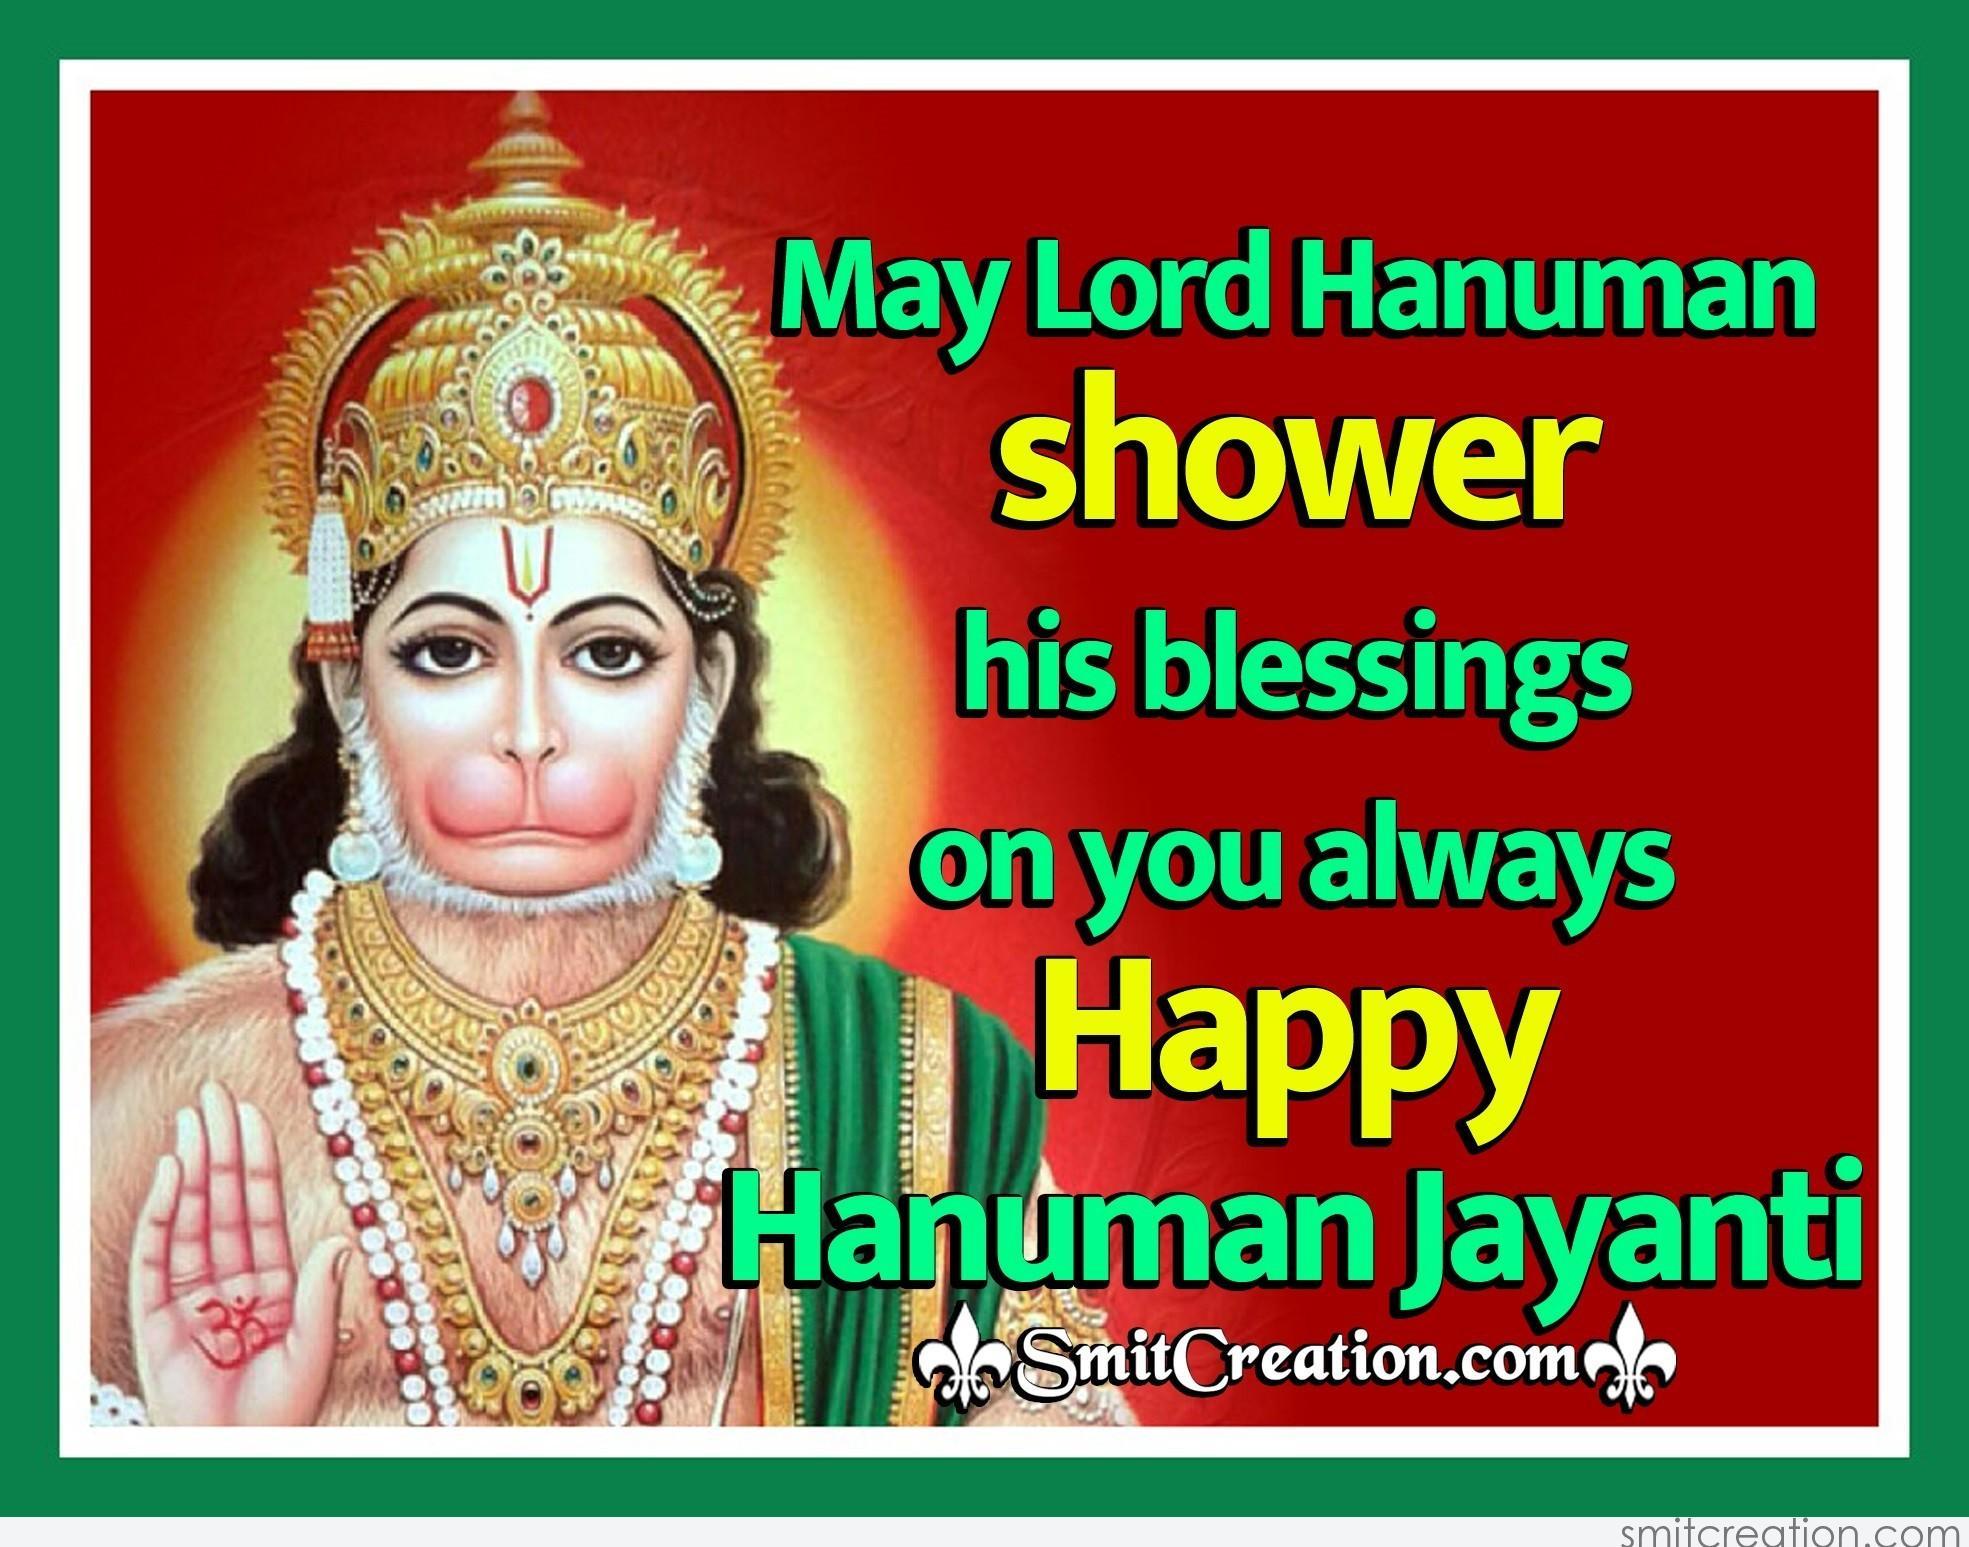 Hanuman Jayanti In English Pictures And Graphics Smitcreationcom